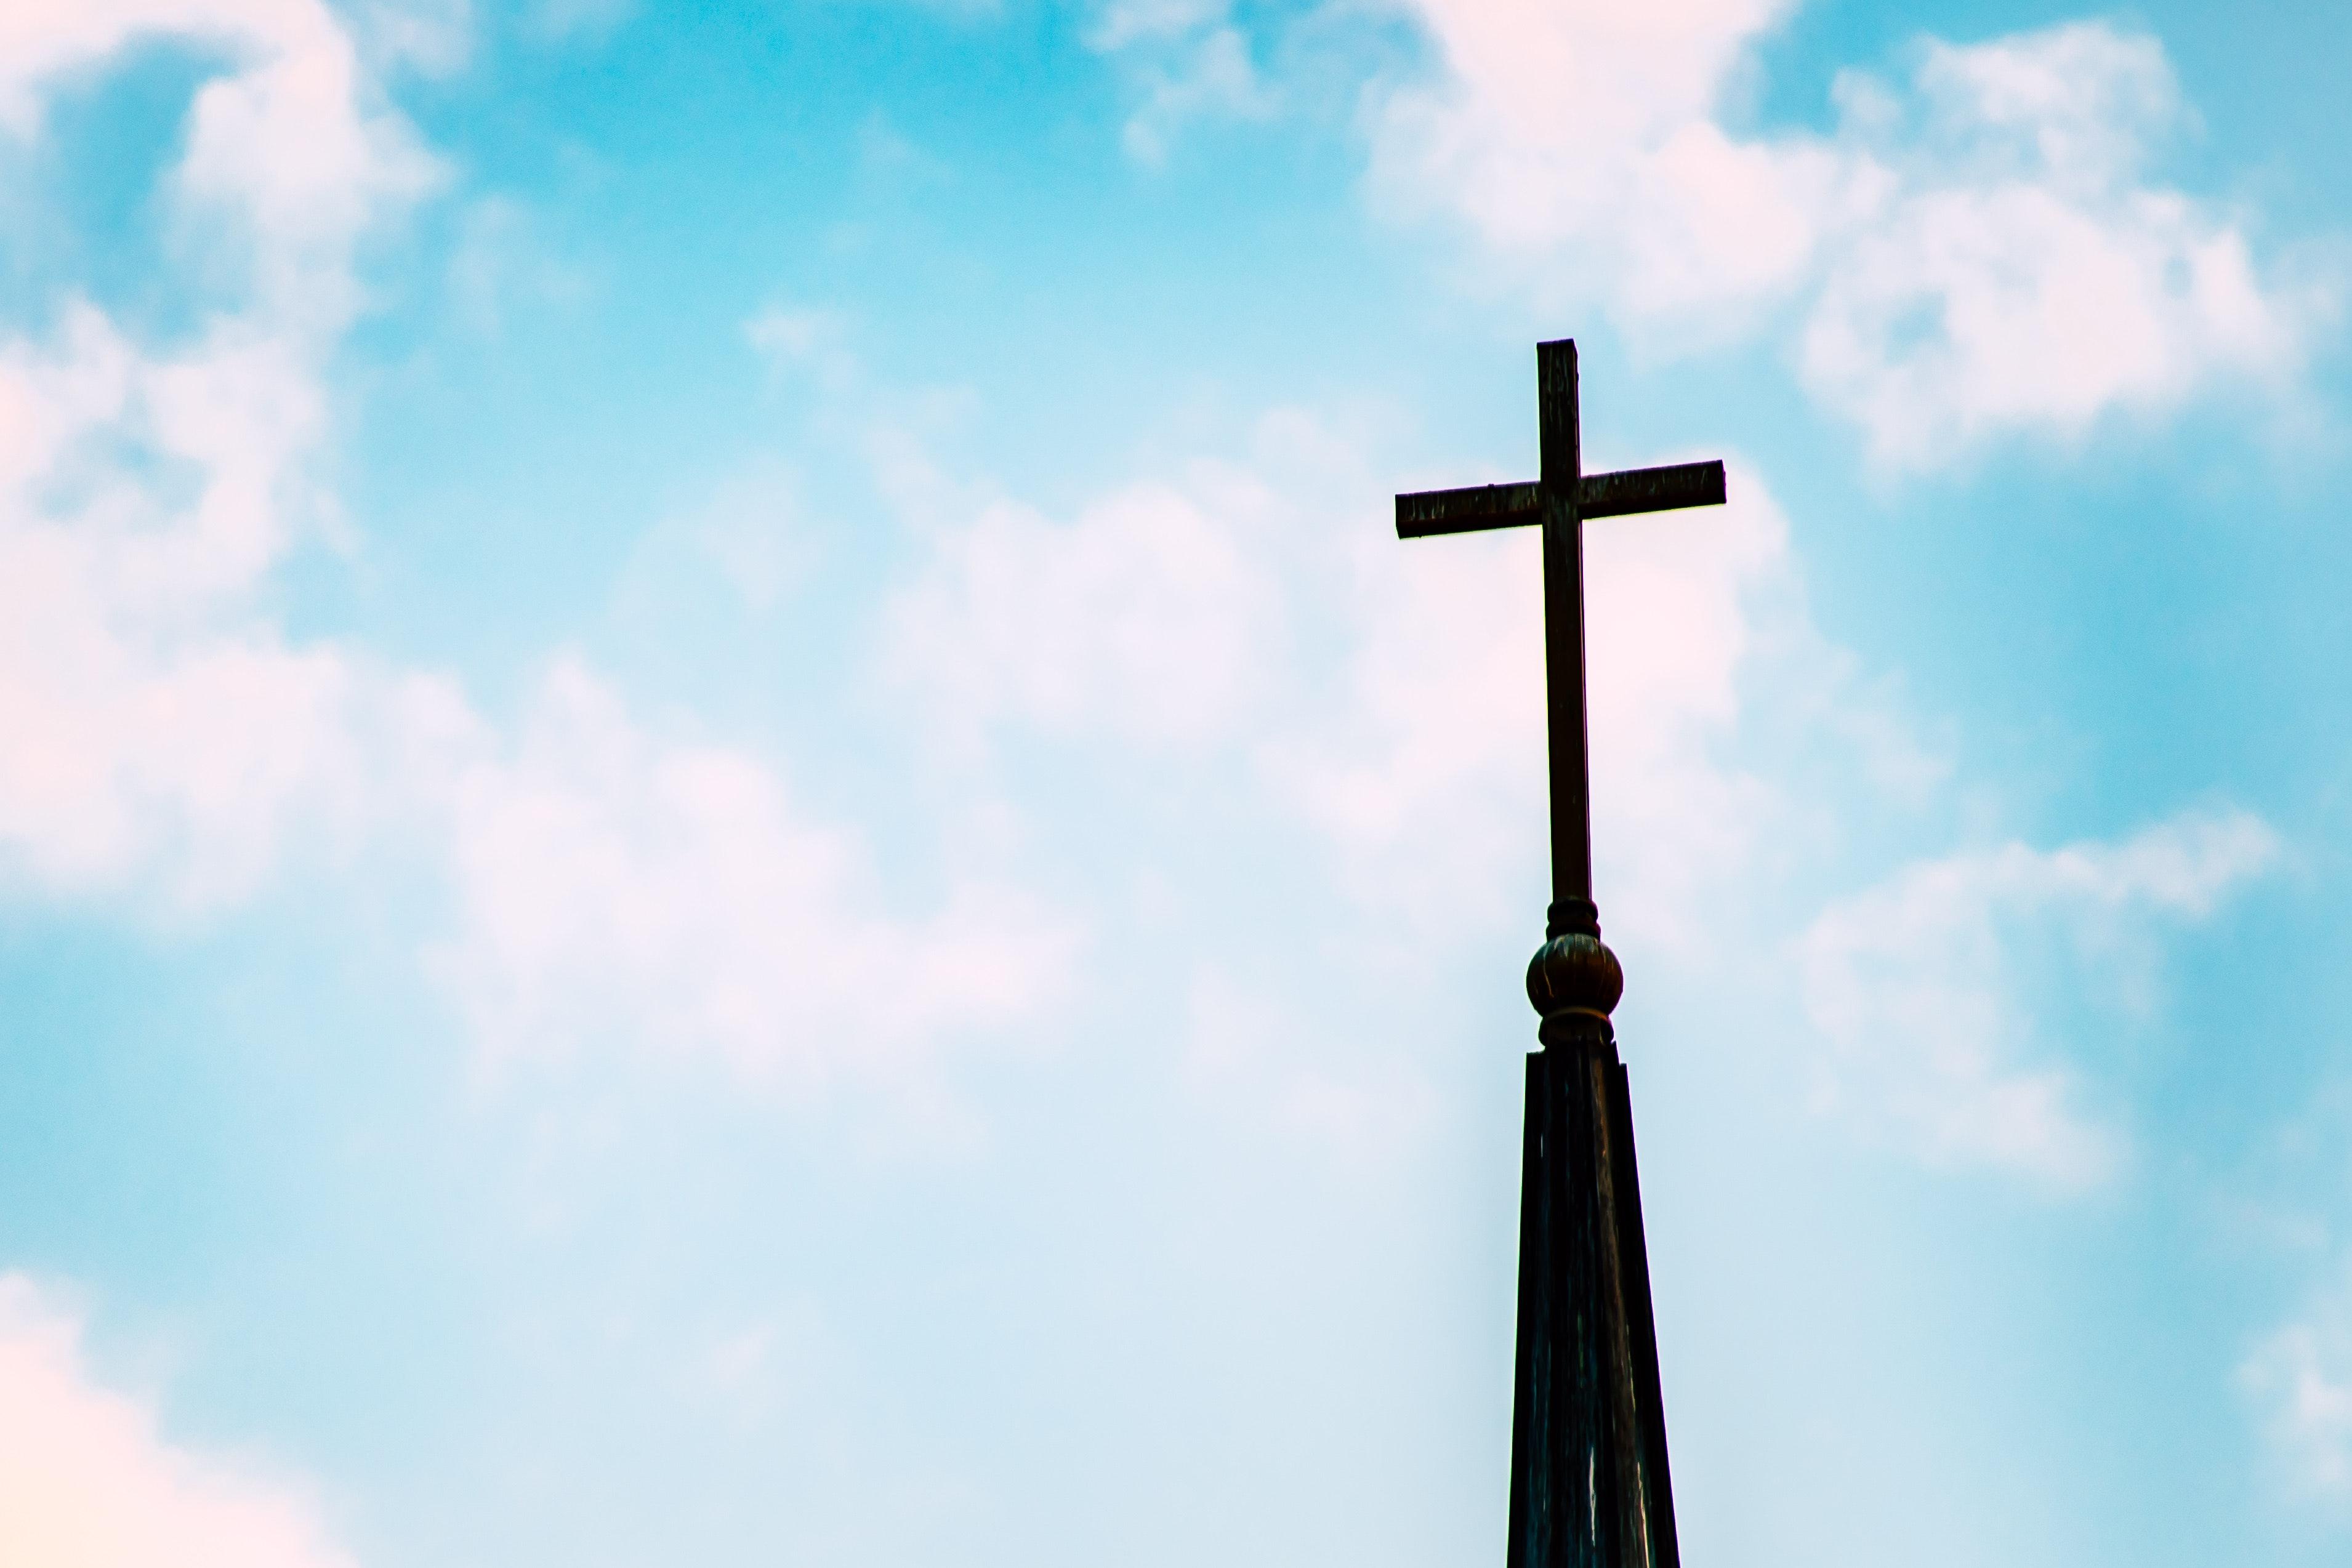 architecture-blue-sky-church-1343325